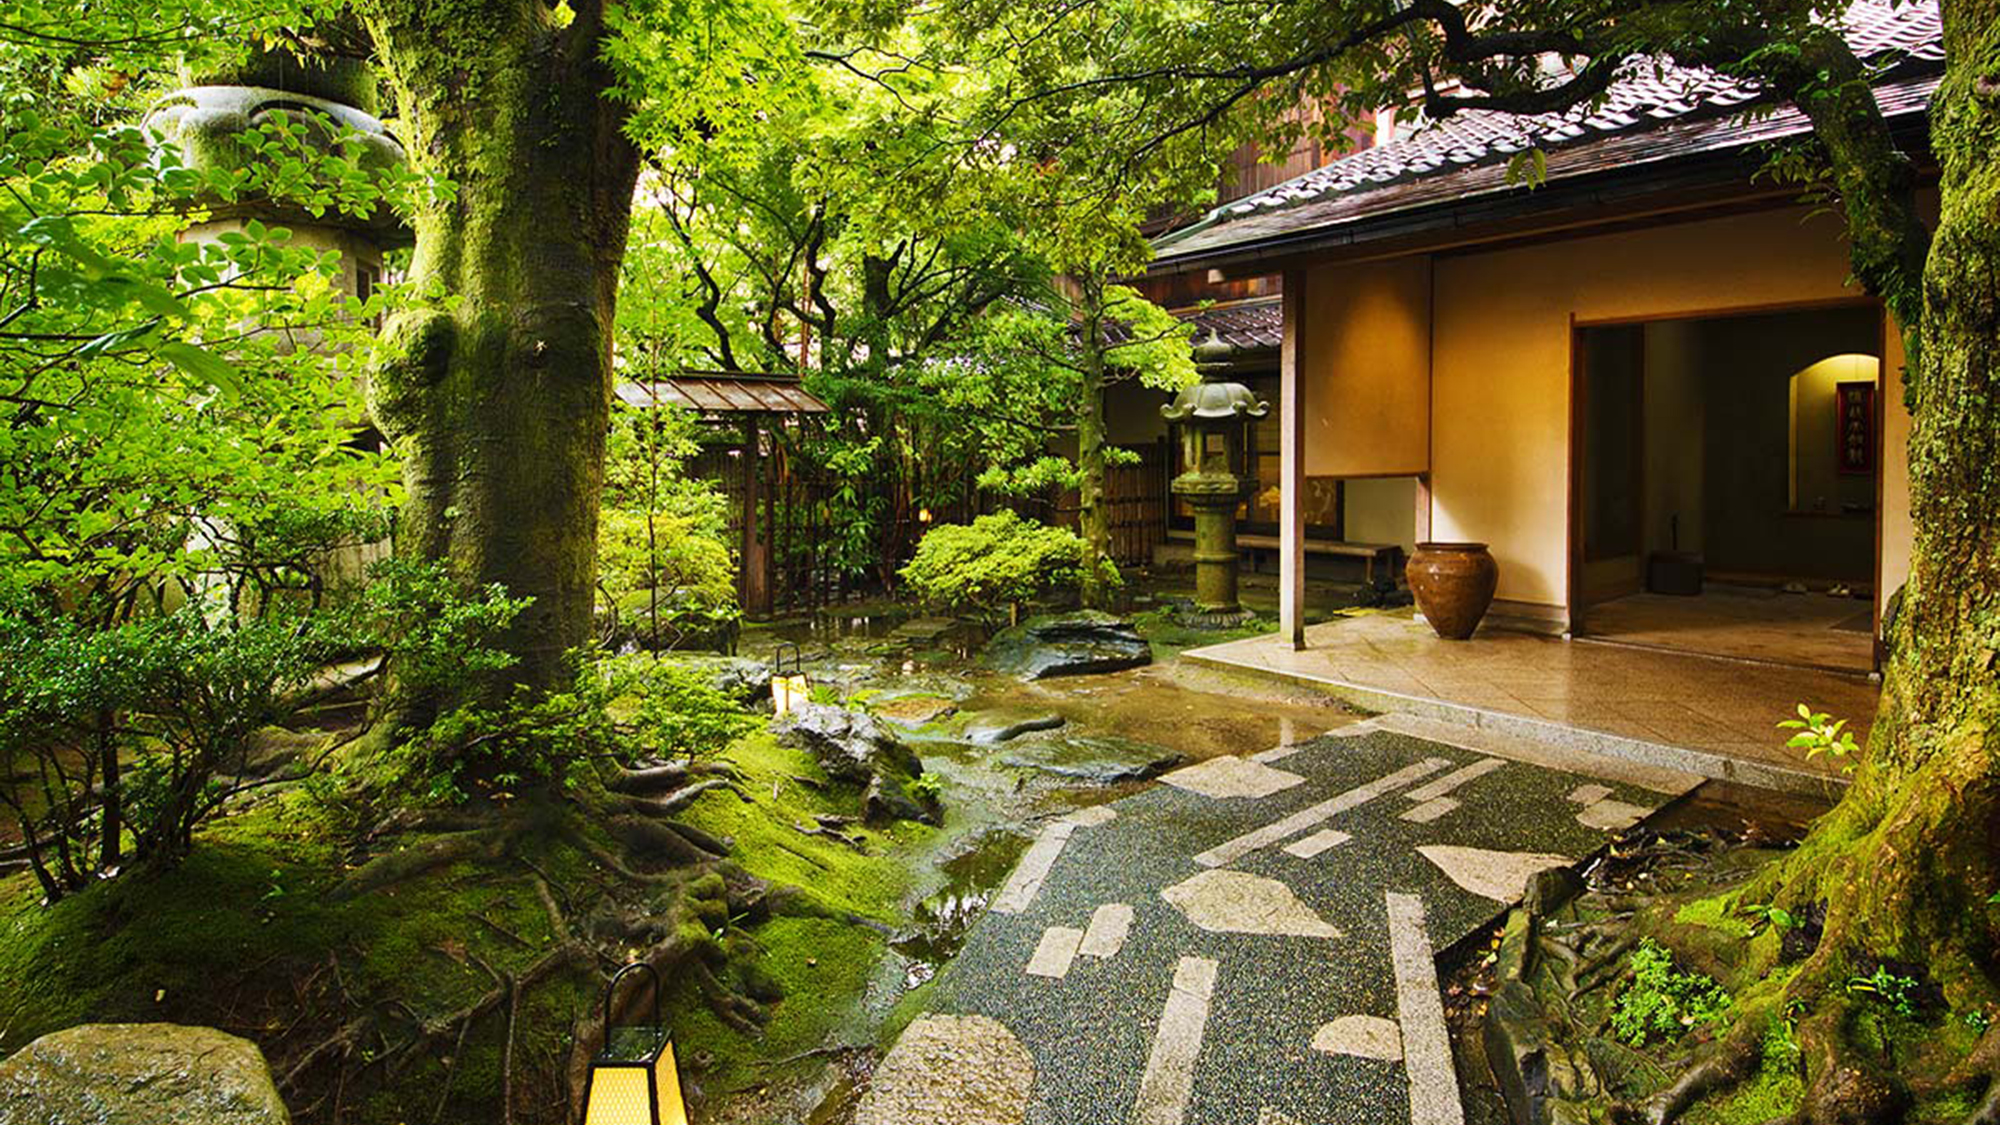 山中温泉 日本が香る宿 胡蝶 外観写真